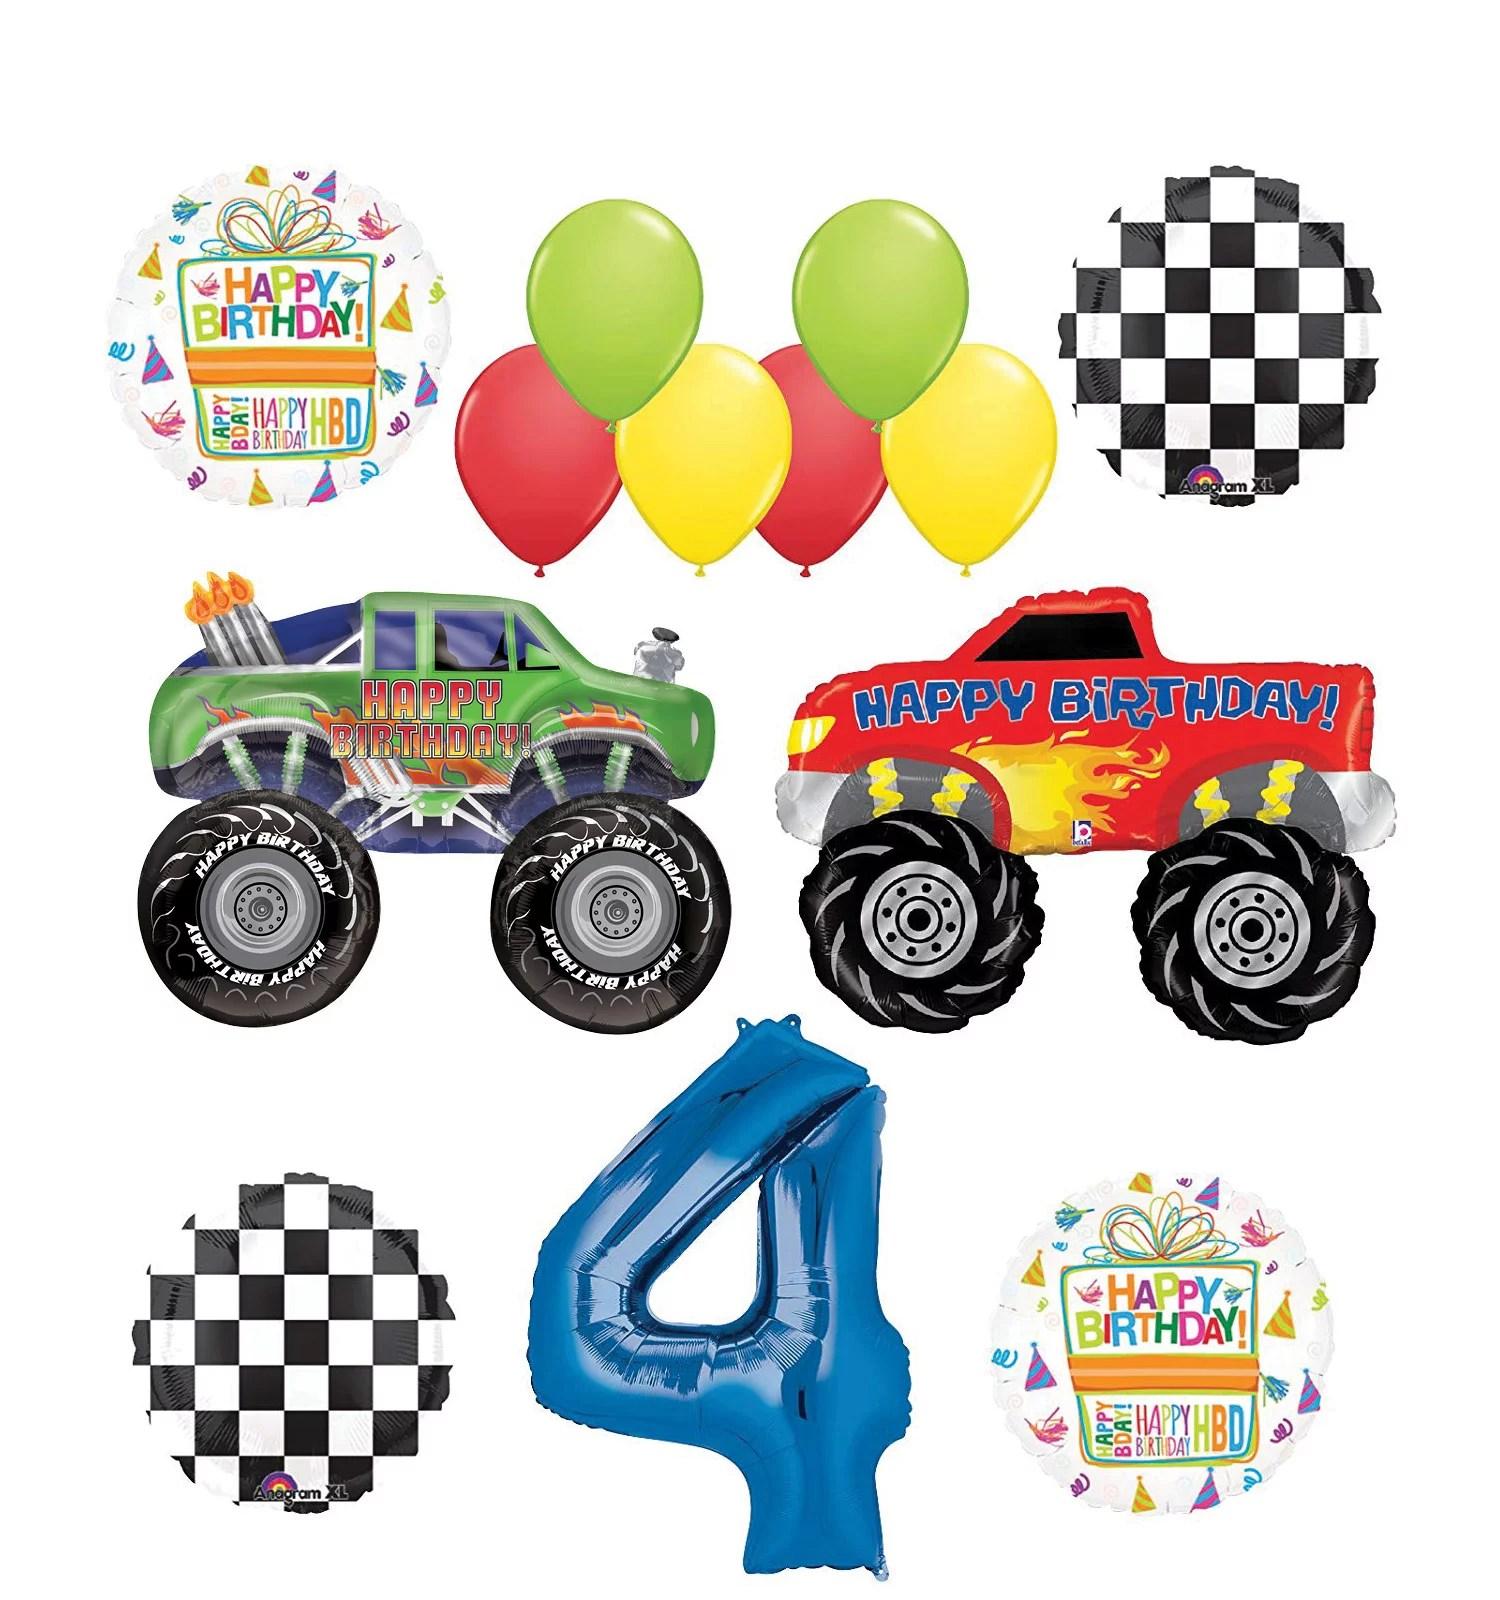 Monster Truck Party Supplies 4th Birthday Balloon Bouquet Decorations Walmart Com Walmart Com